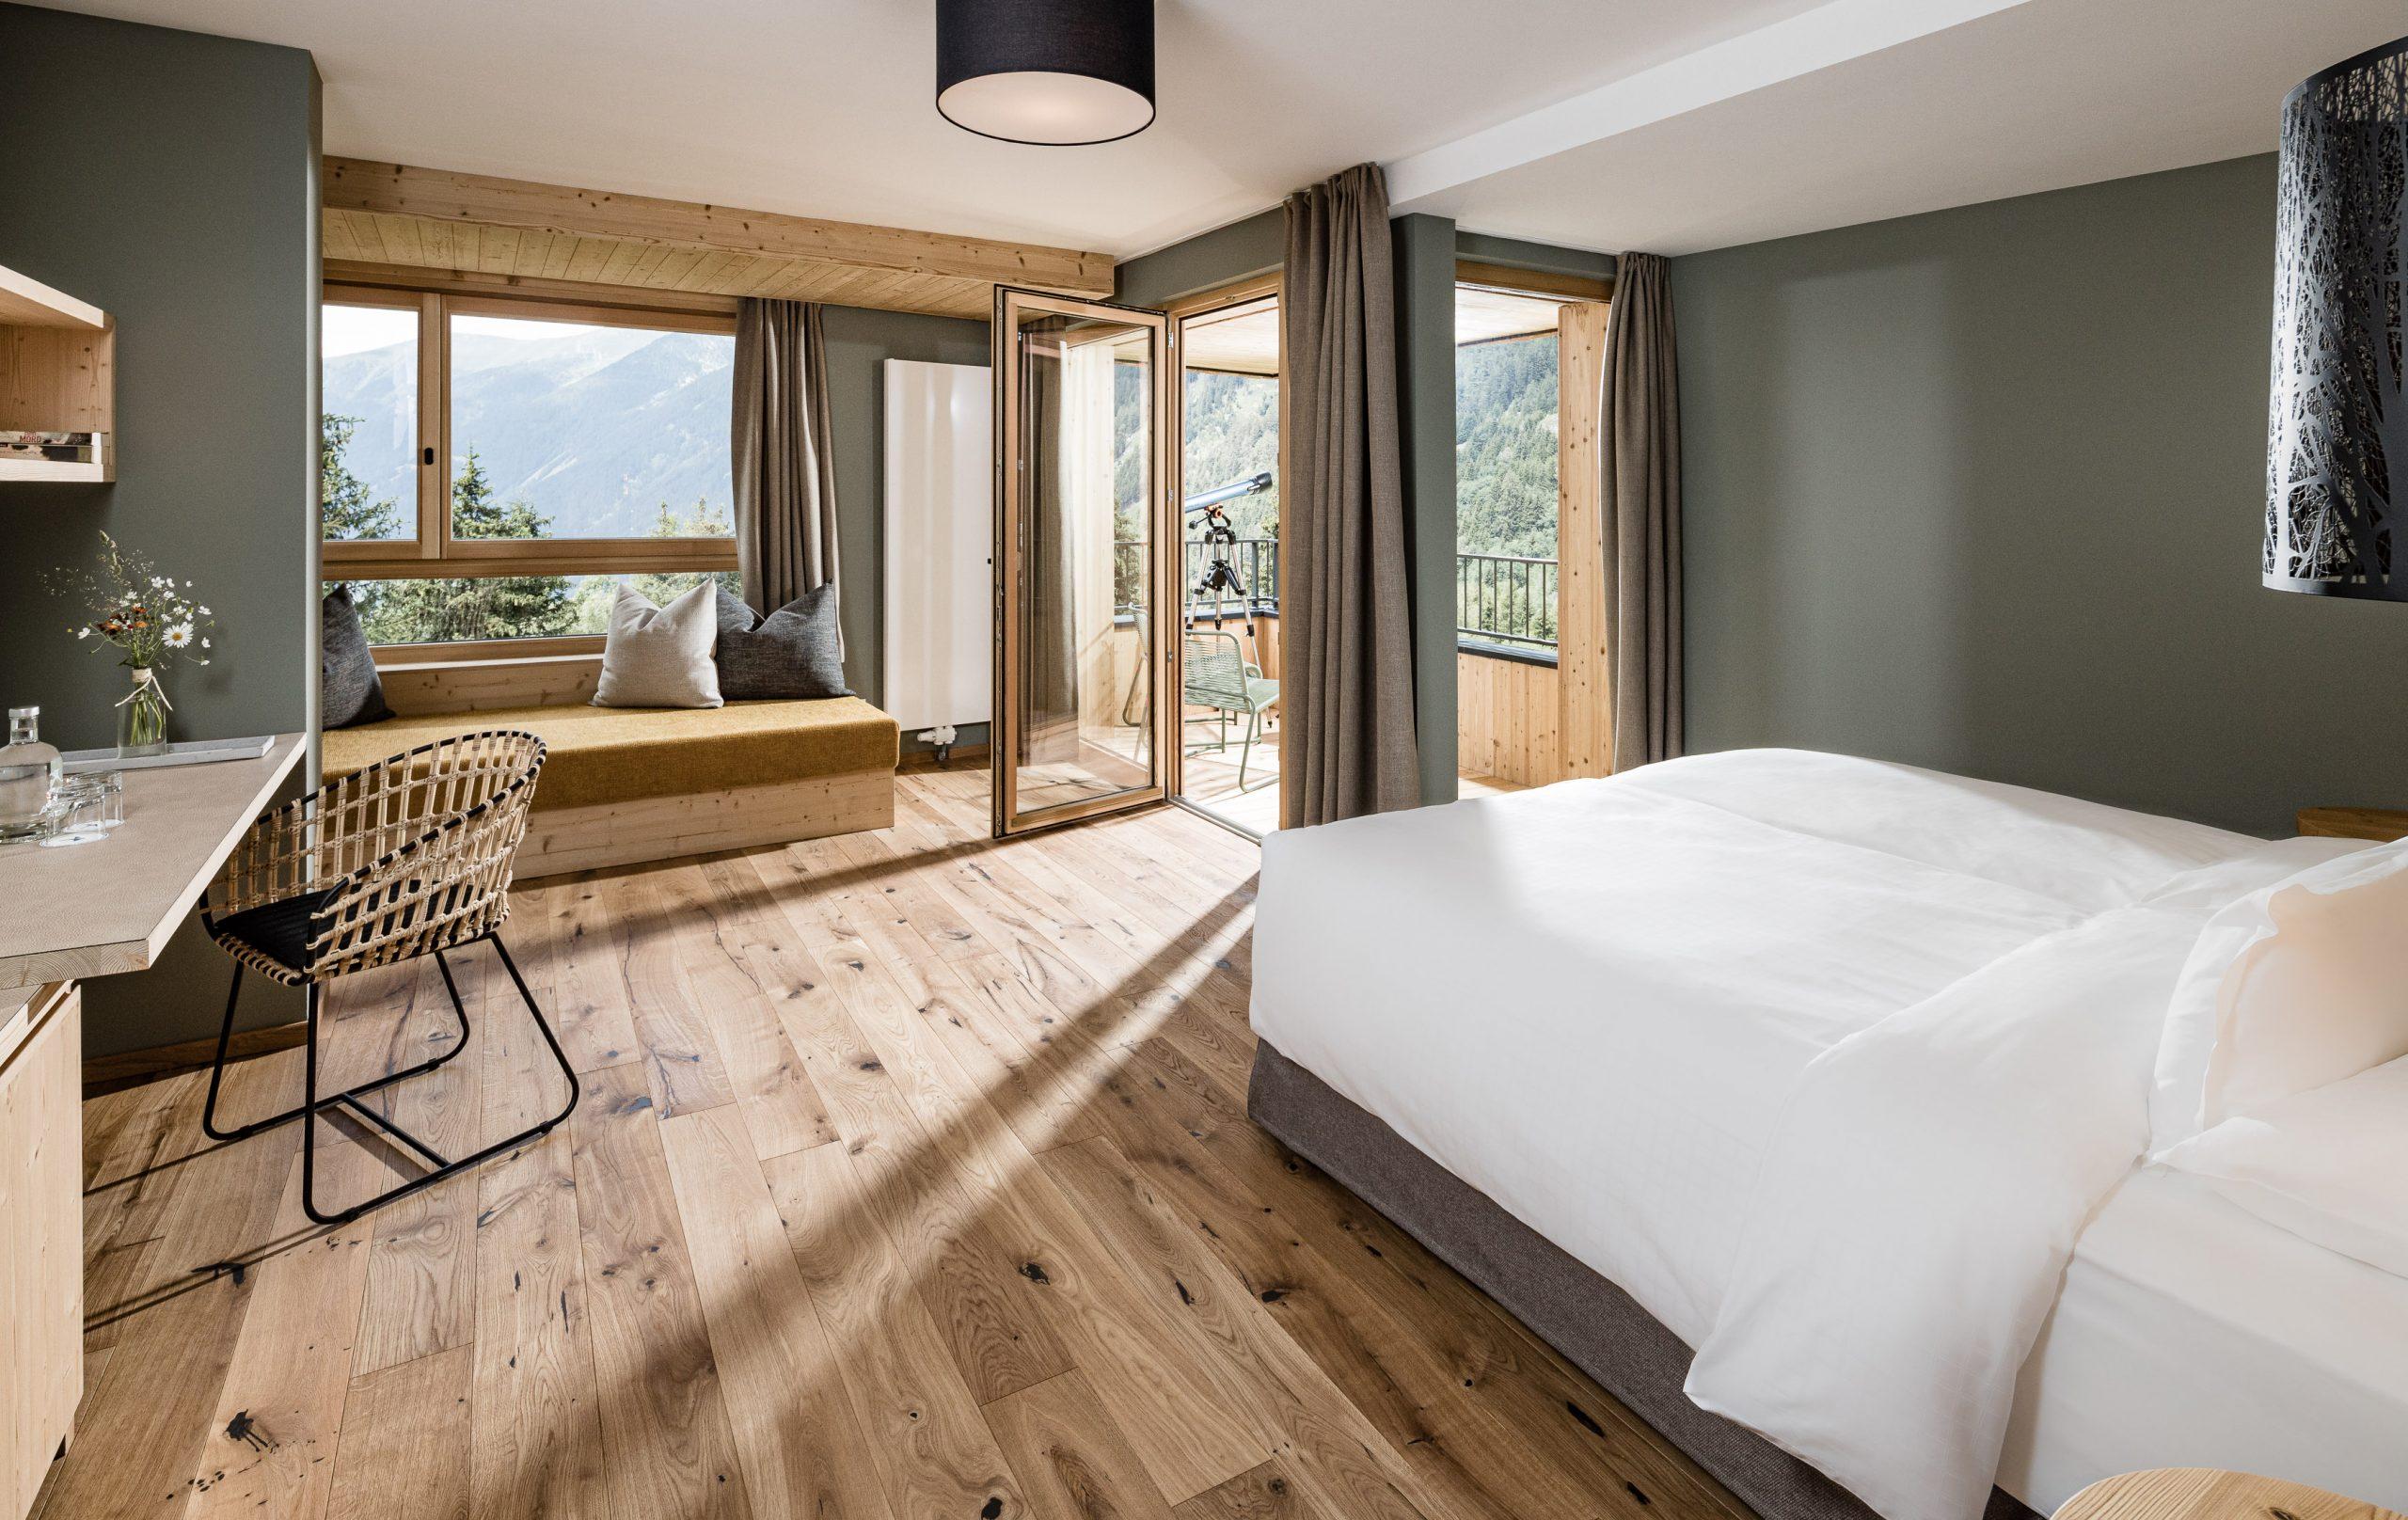 ©ALPENRESIDENZ FALKENSTEINER HOTEL - VALLE DI ANTERSELVA | FOTO: KLAUS PETERLIN